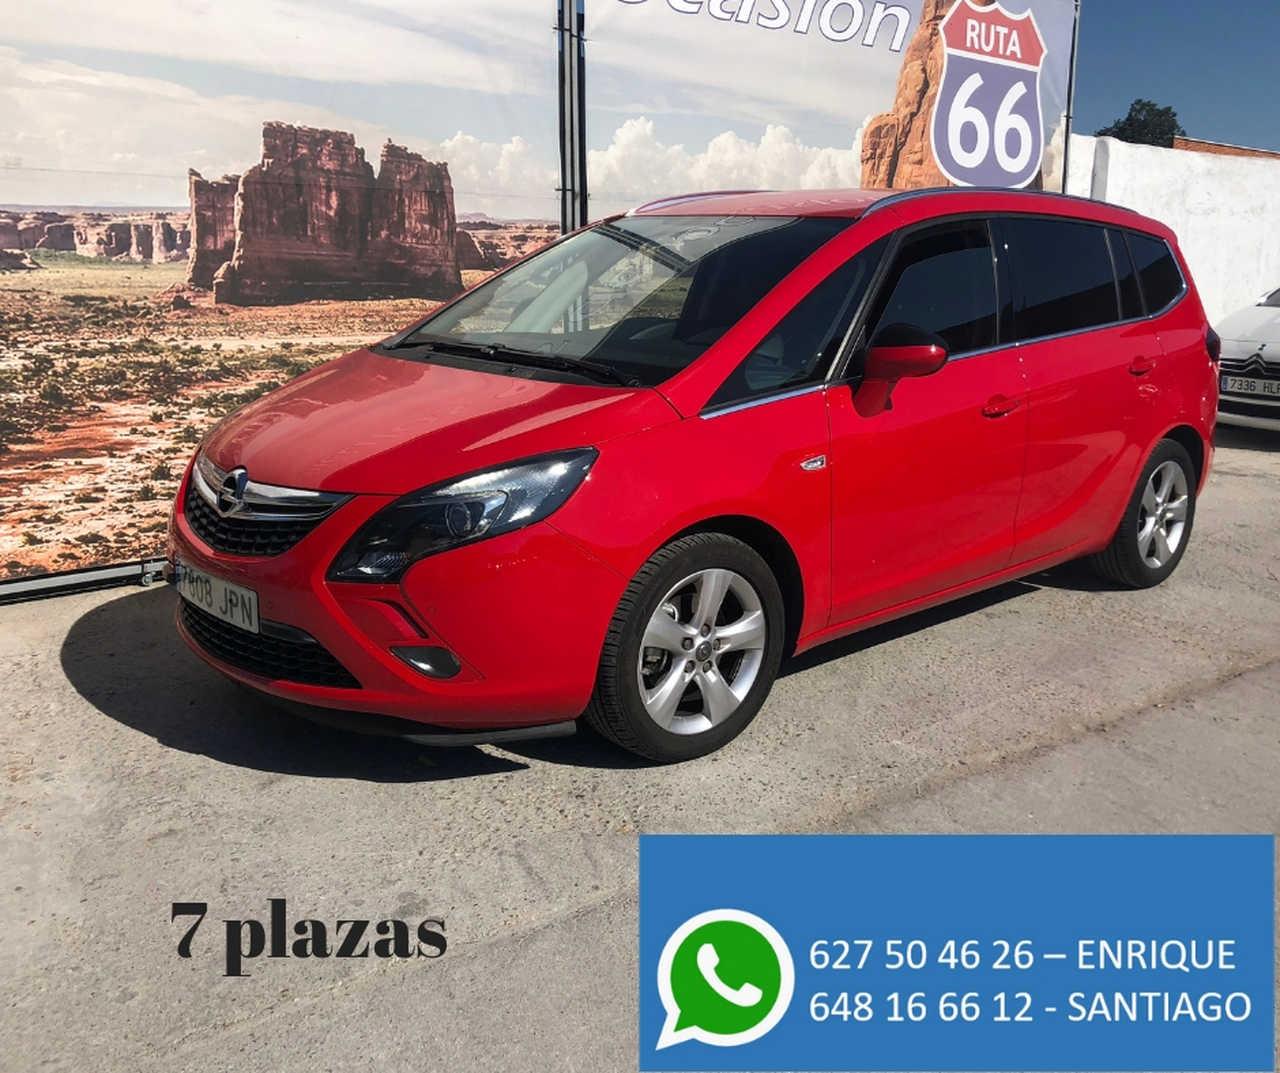 Opel Zafira  Tourer    1.6 CDTI   - Foto 1